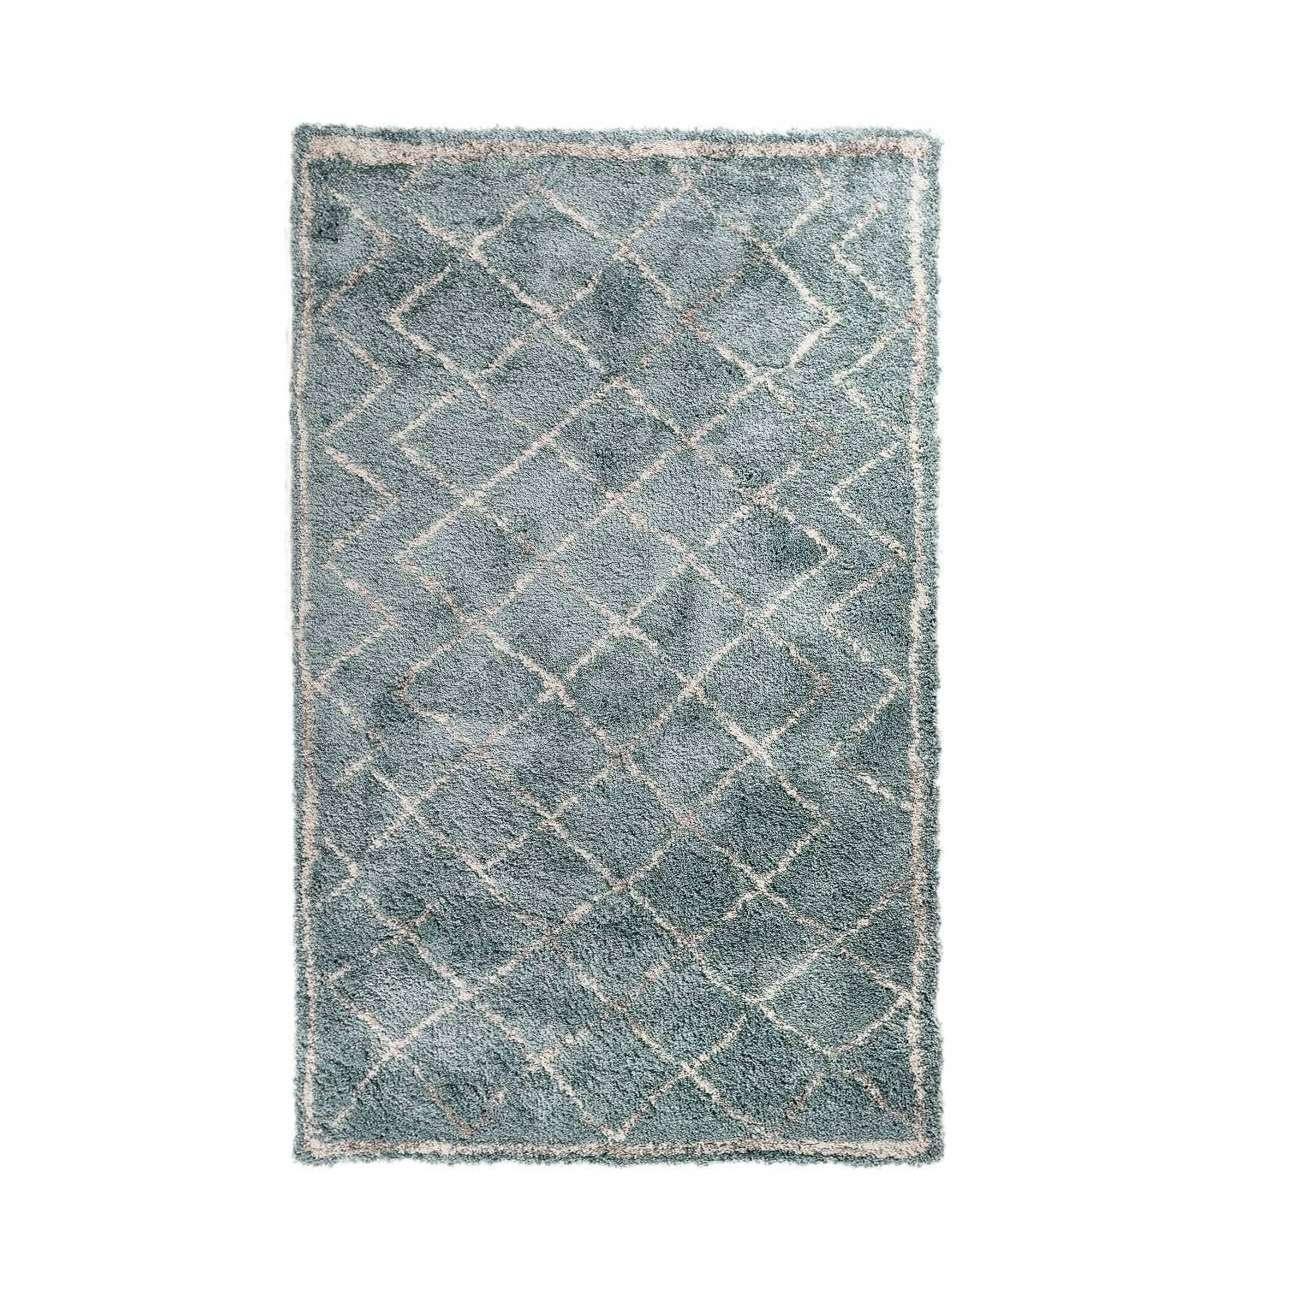 dywan royal teal blue 160x230cm dekoria. Black Bedroom Furniture Sets. Home Design Ideas